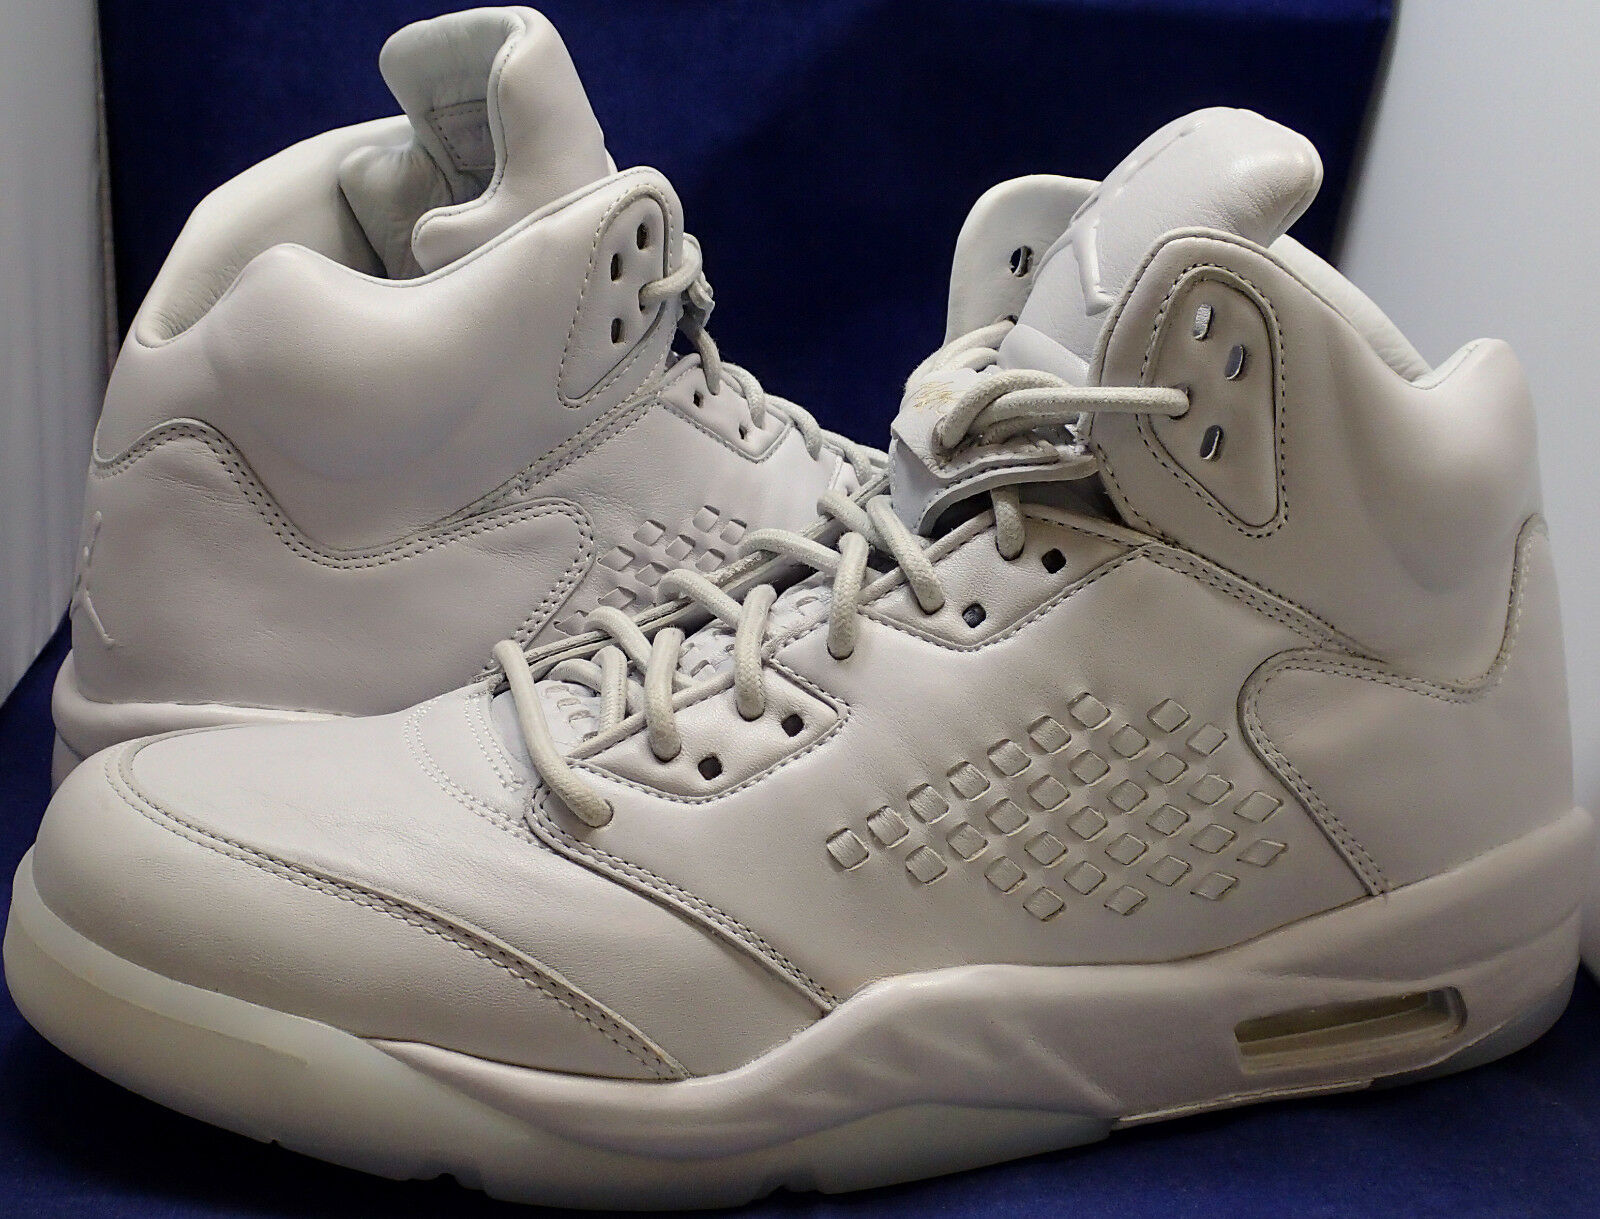 Nike Air Jordan 5 V Retro Premium Pure Platinum SZ 12 ( 881432-003 )